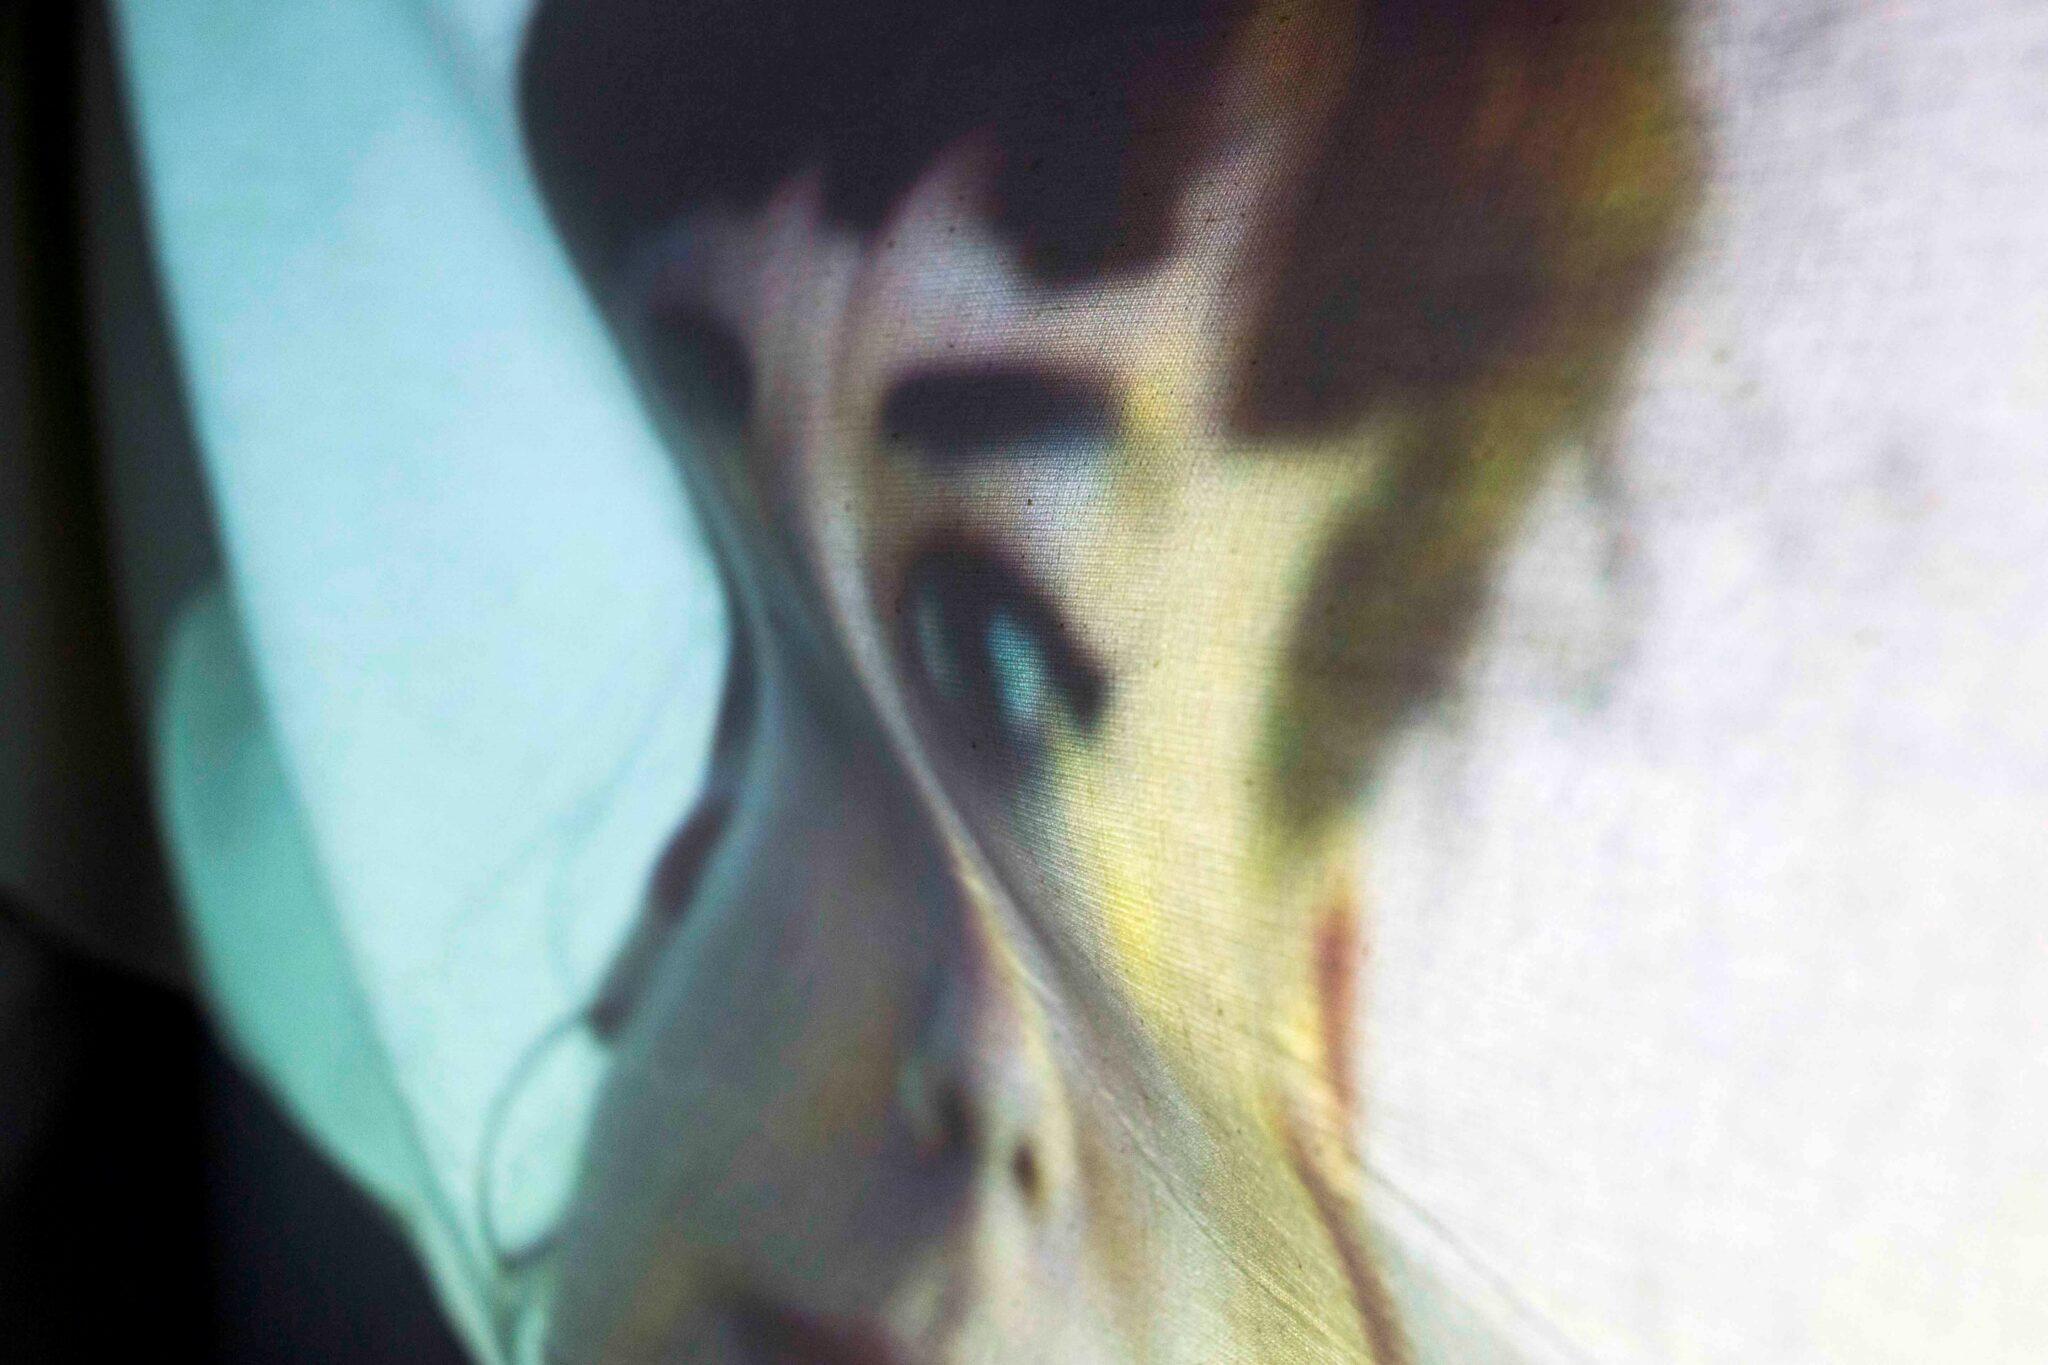 En projicerat ansikte på en knölig textil.